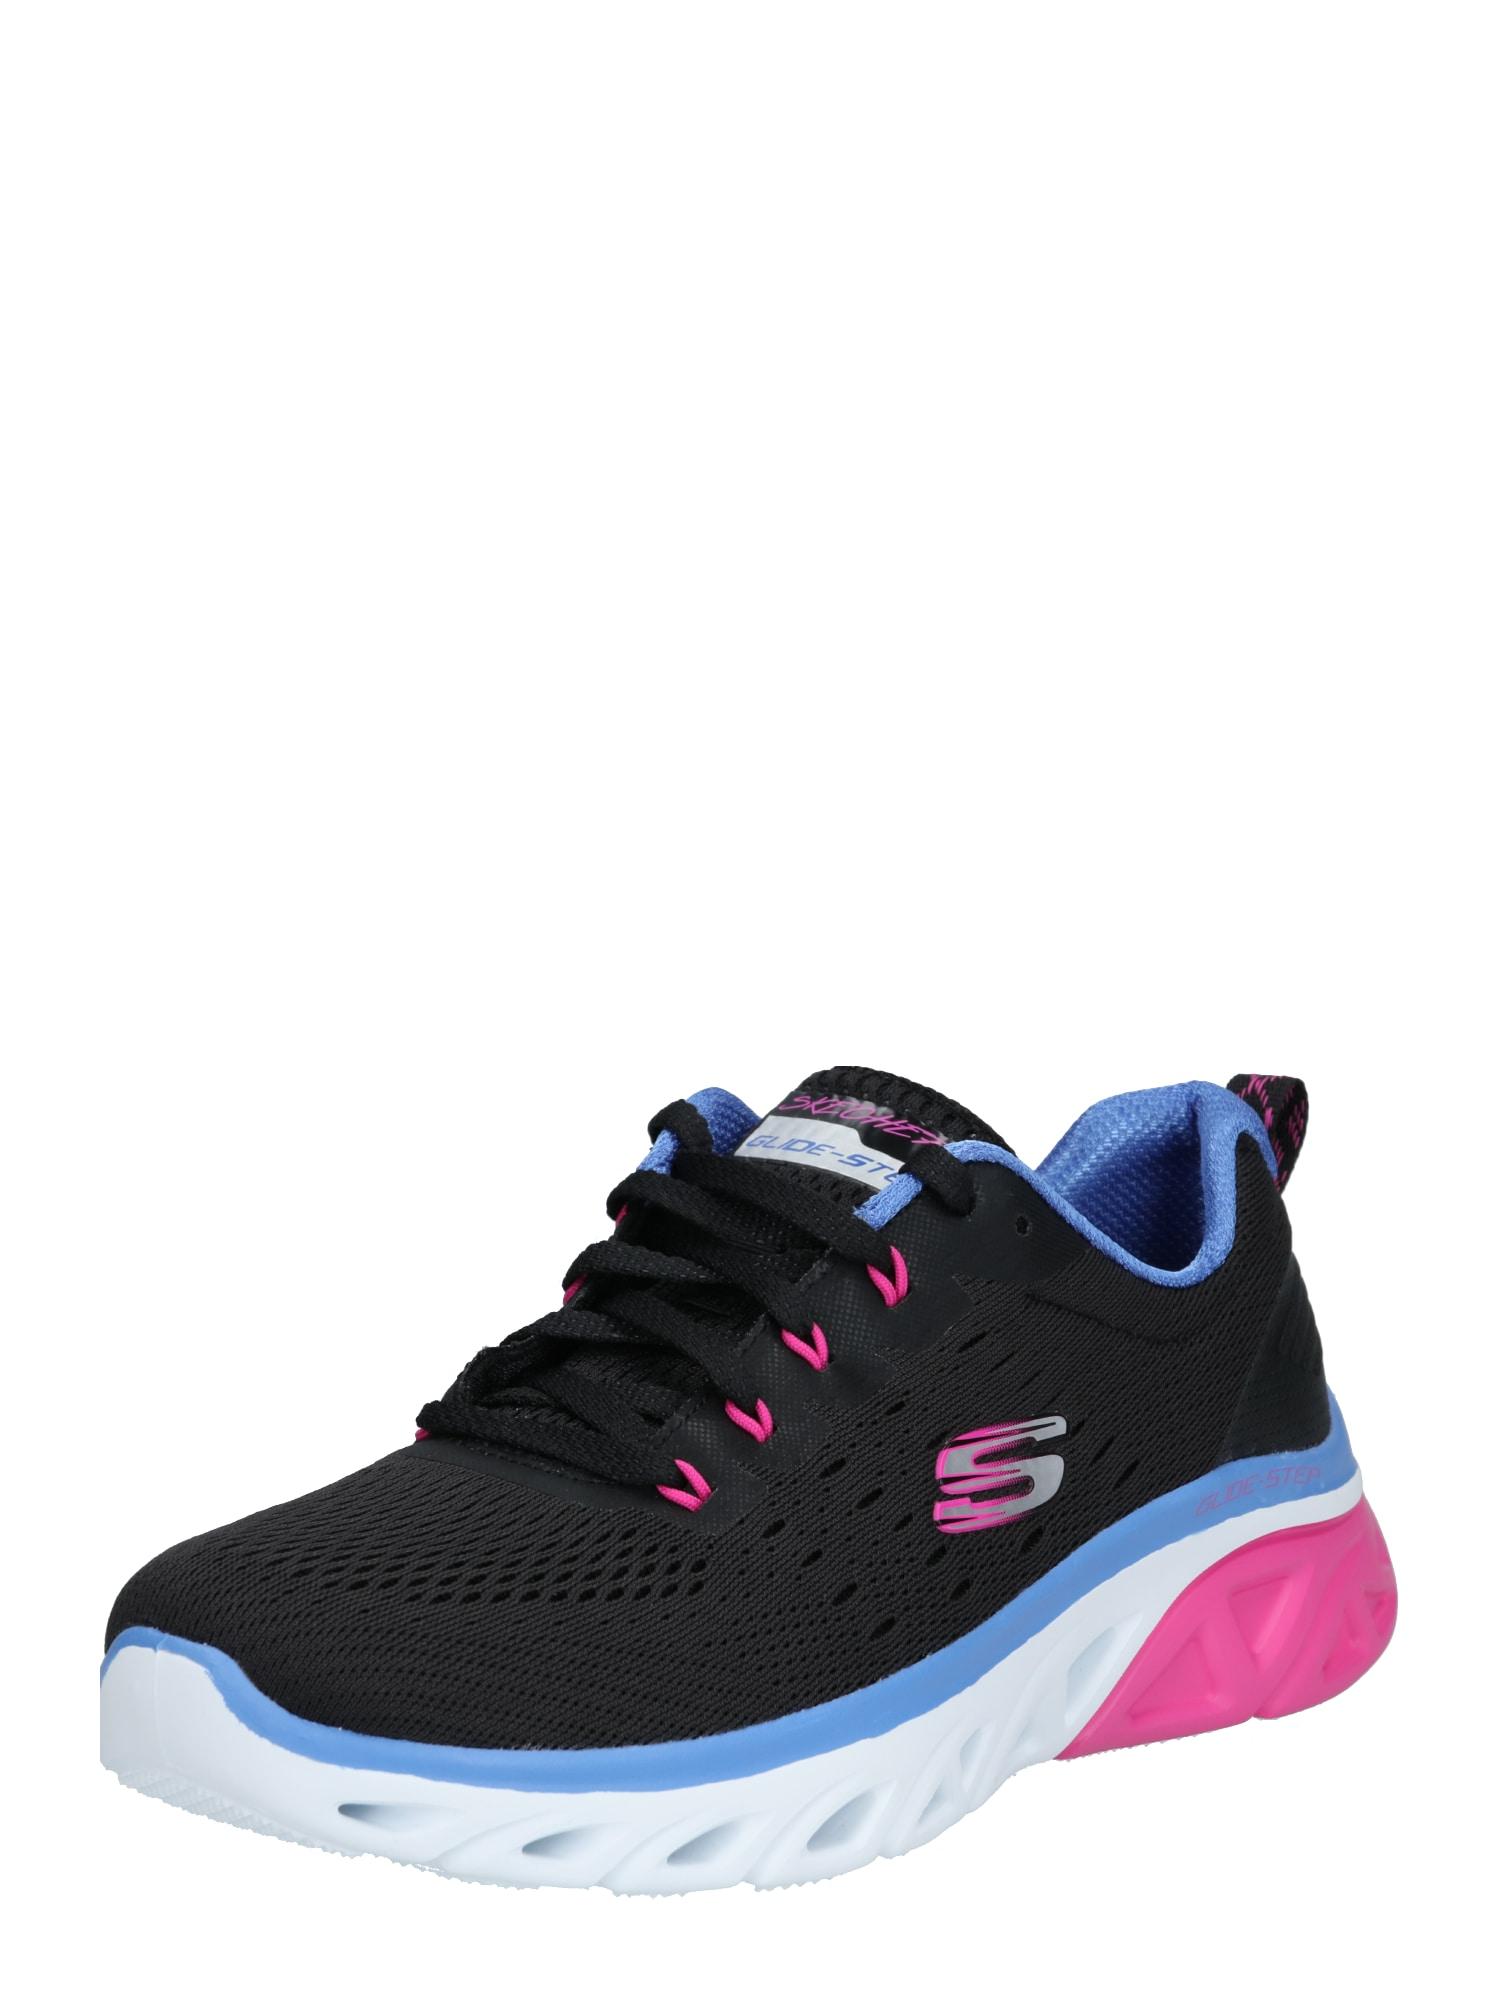 SKECHERS Nízke tenisky 'Glide Step'  čierna / modrá / ružová